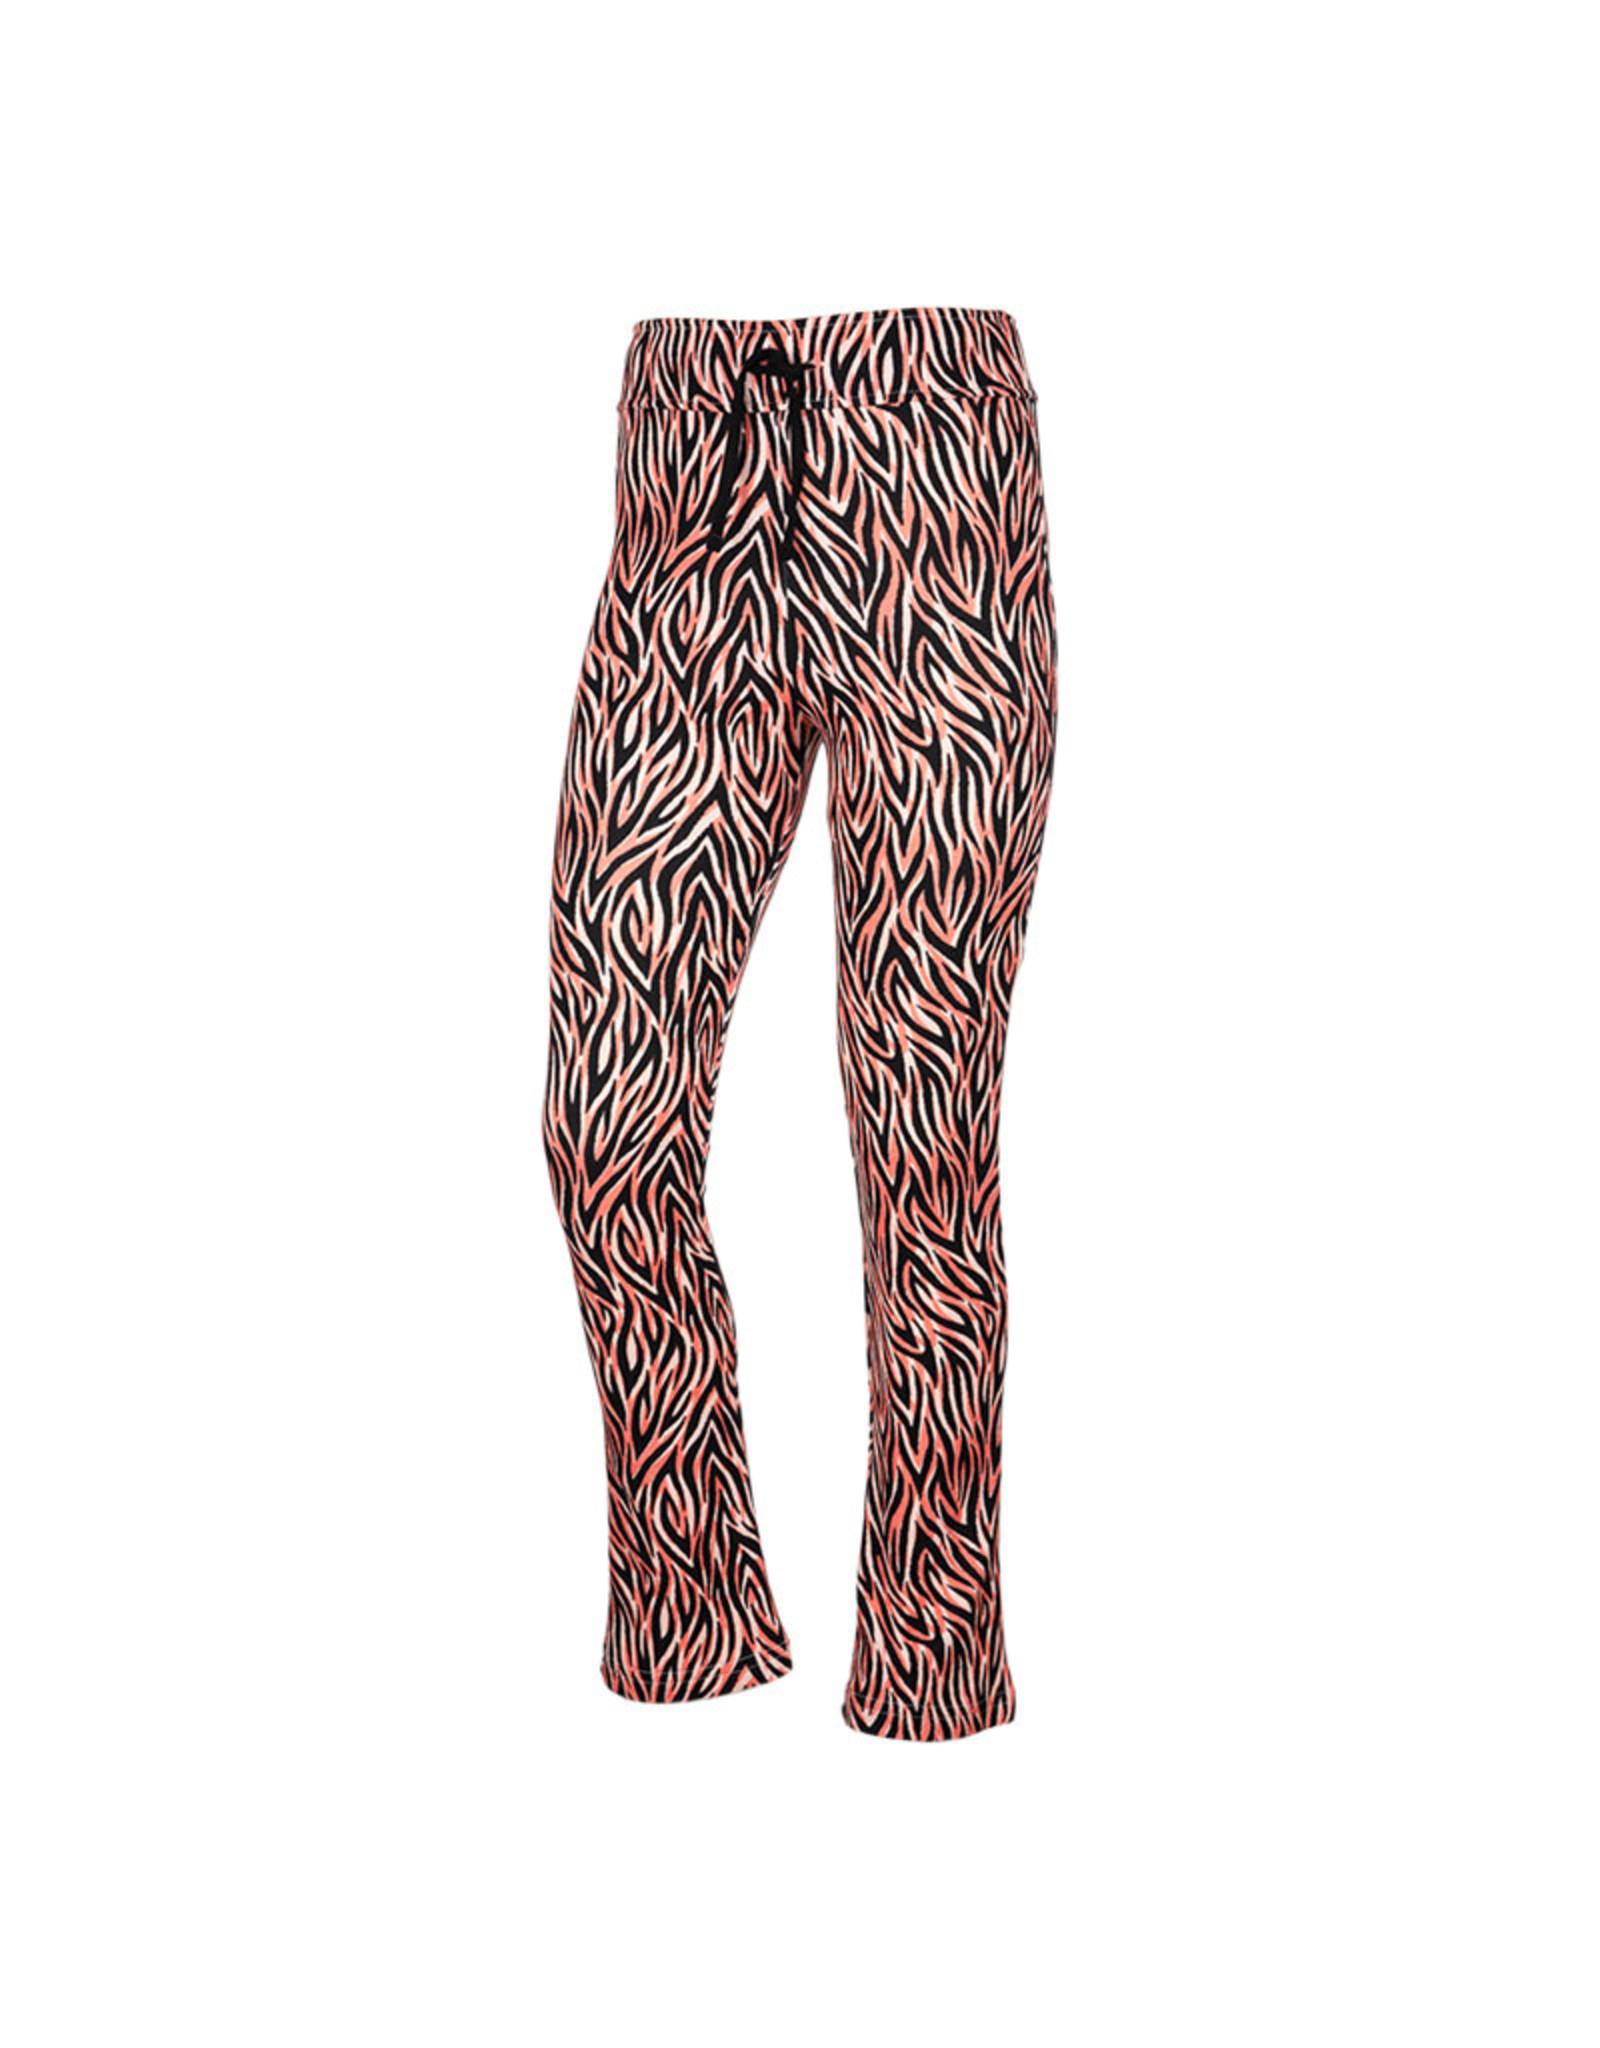 Kie-stone broek stretch tijger